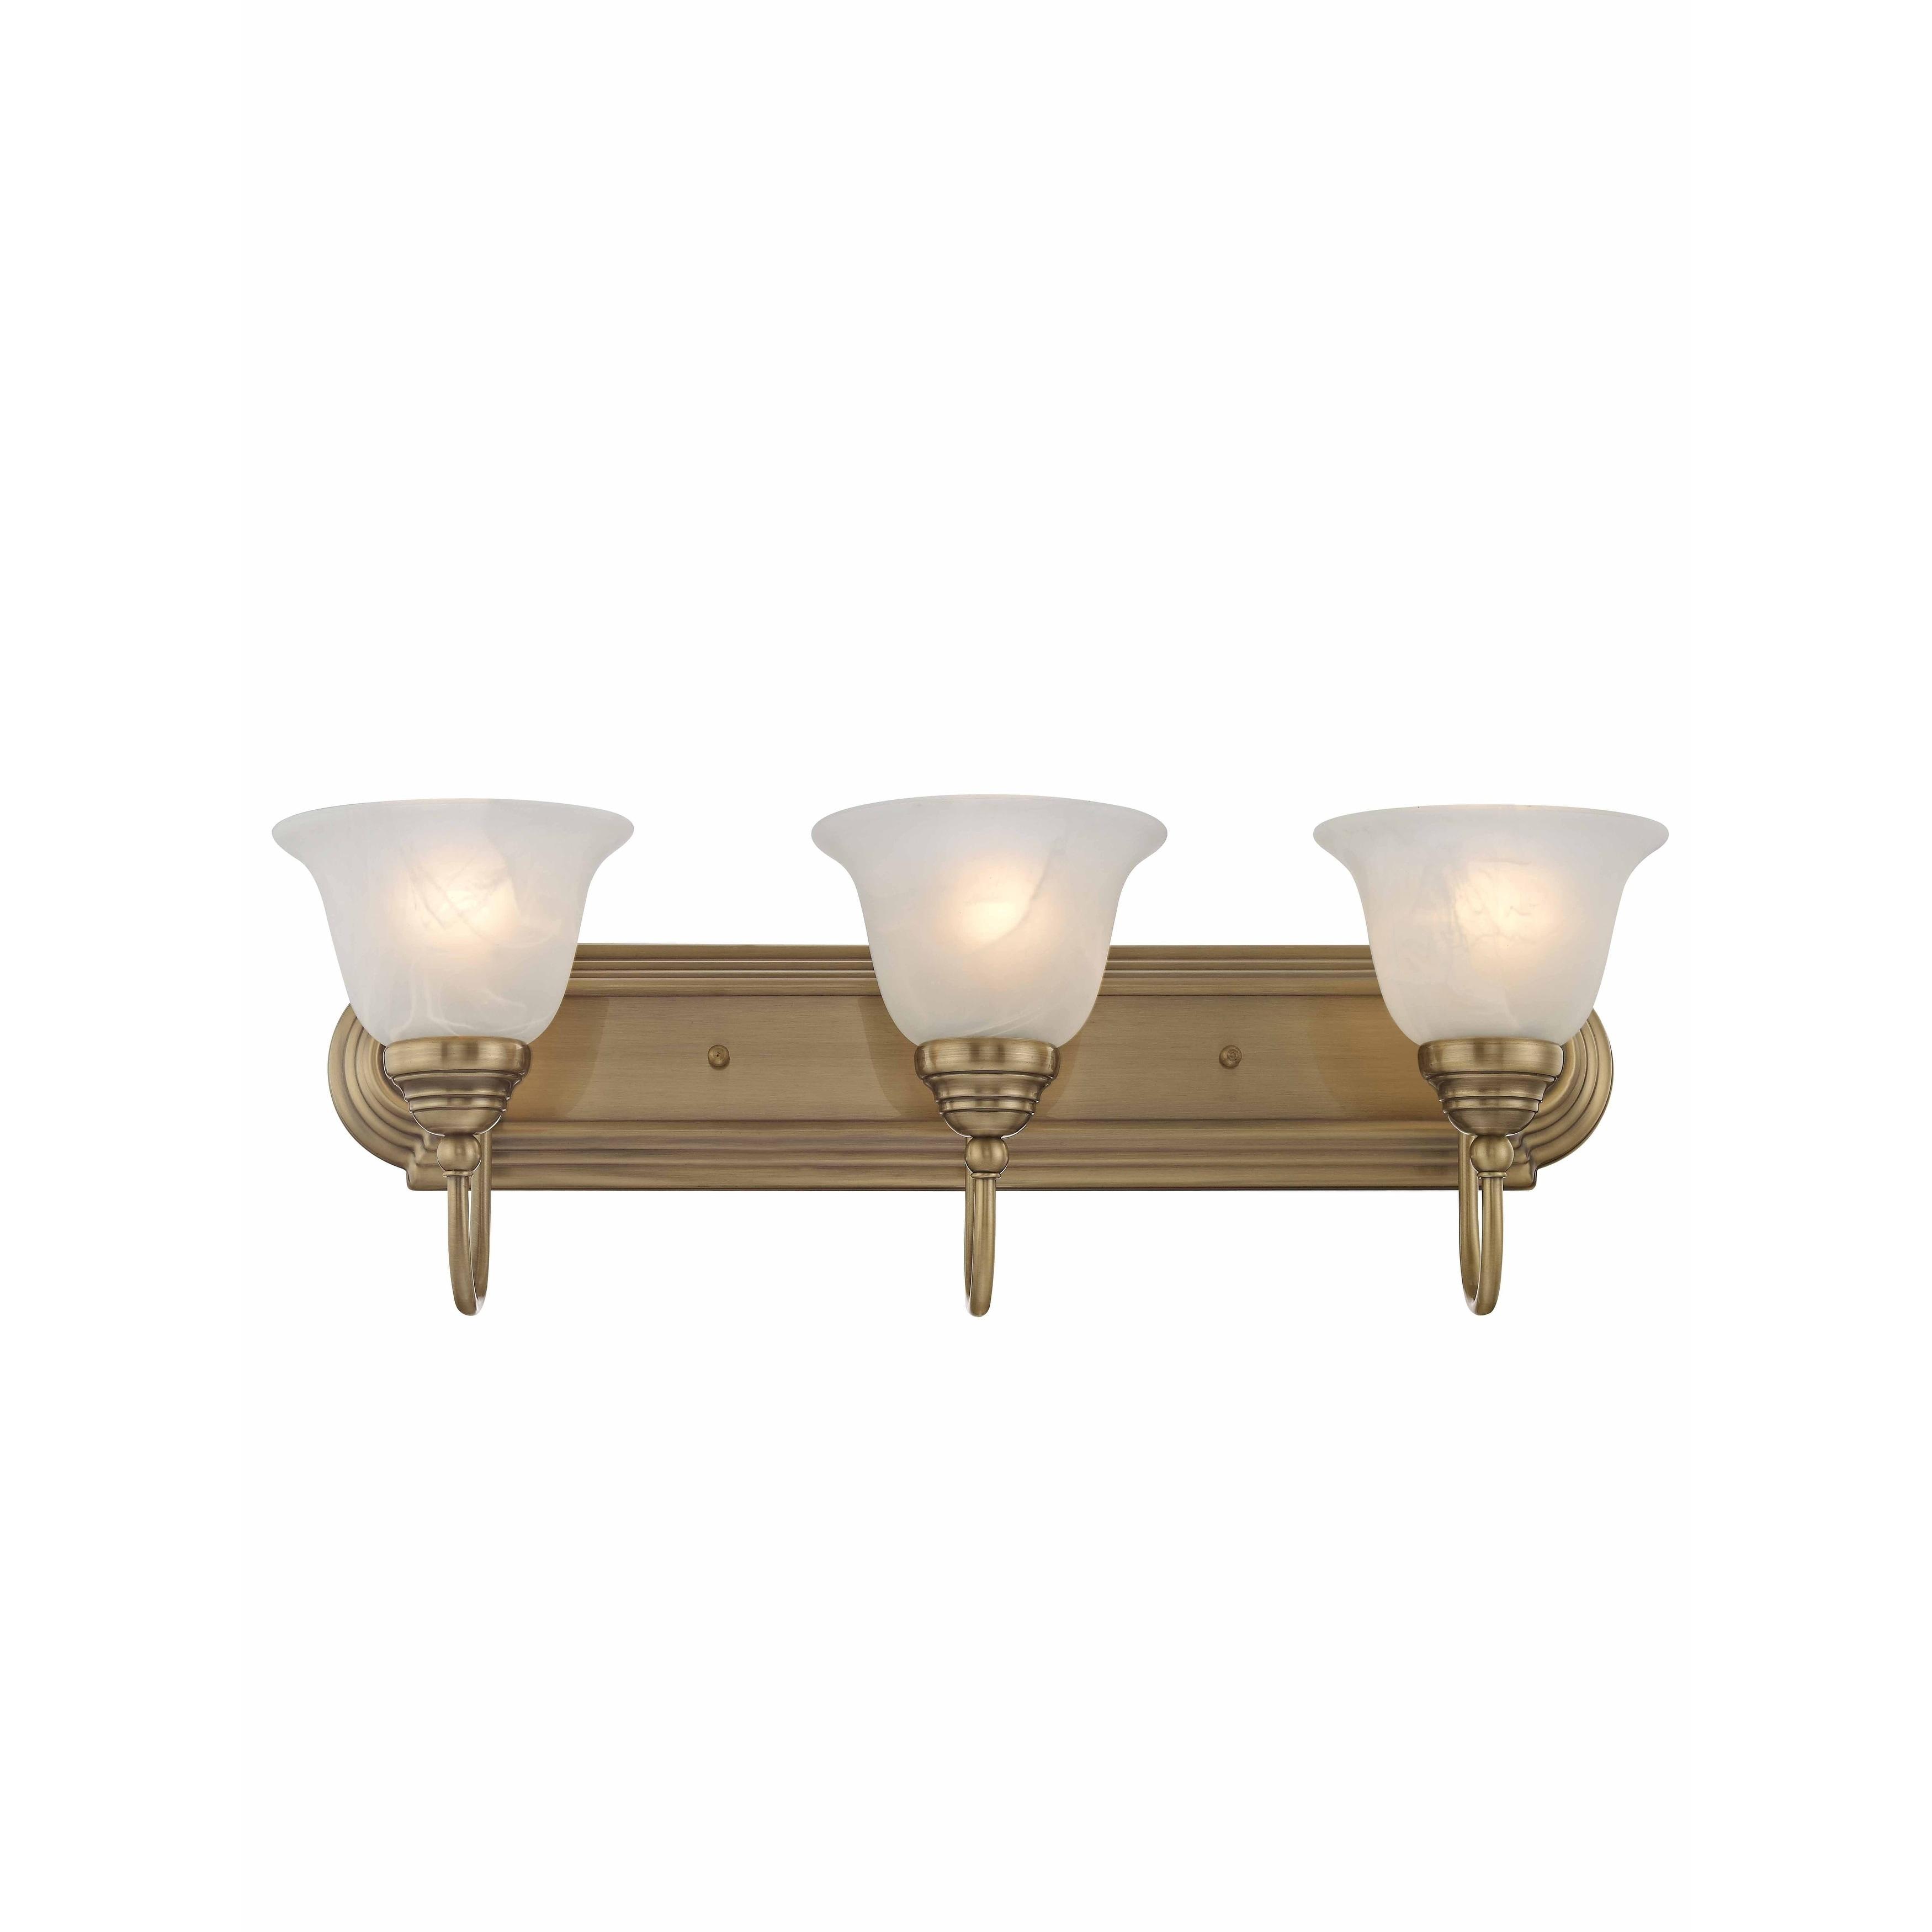 Shop livex lighting belmont gold brass 3 light bathroom light fixture free shipping today overstock com 12039677